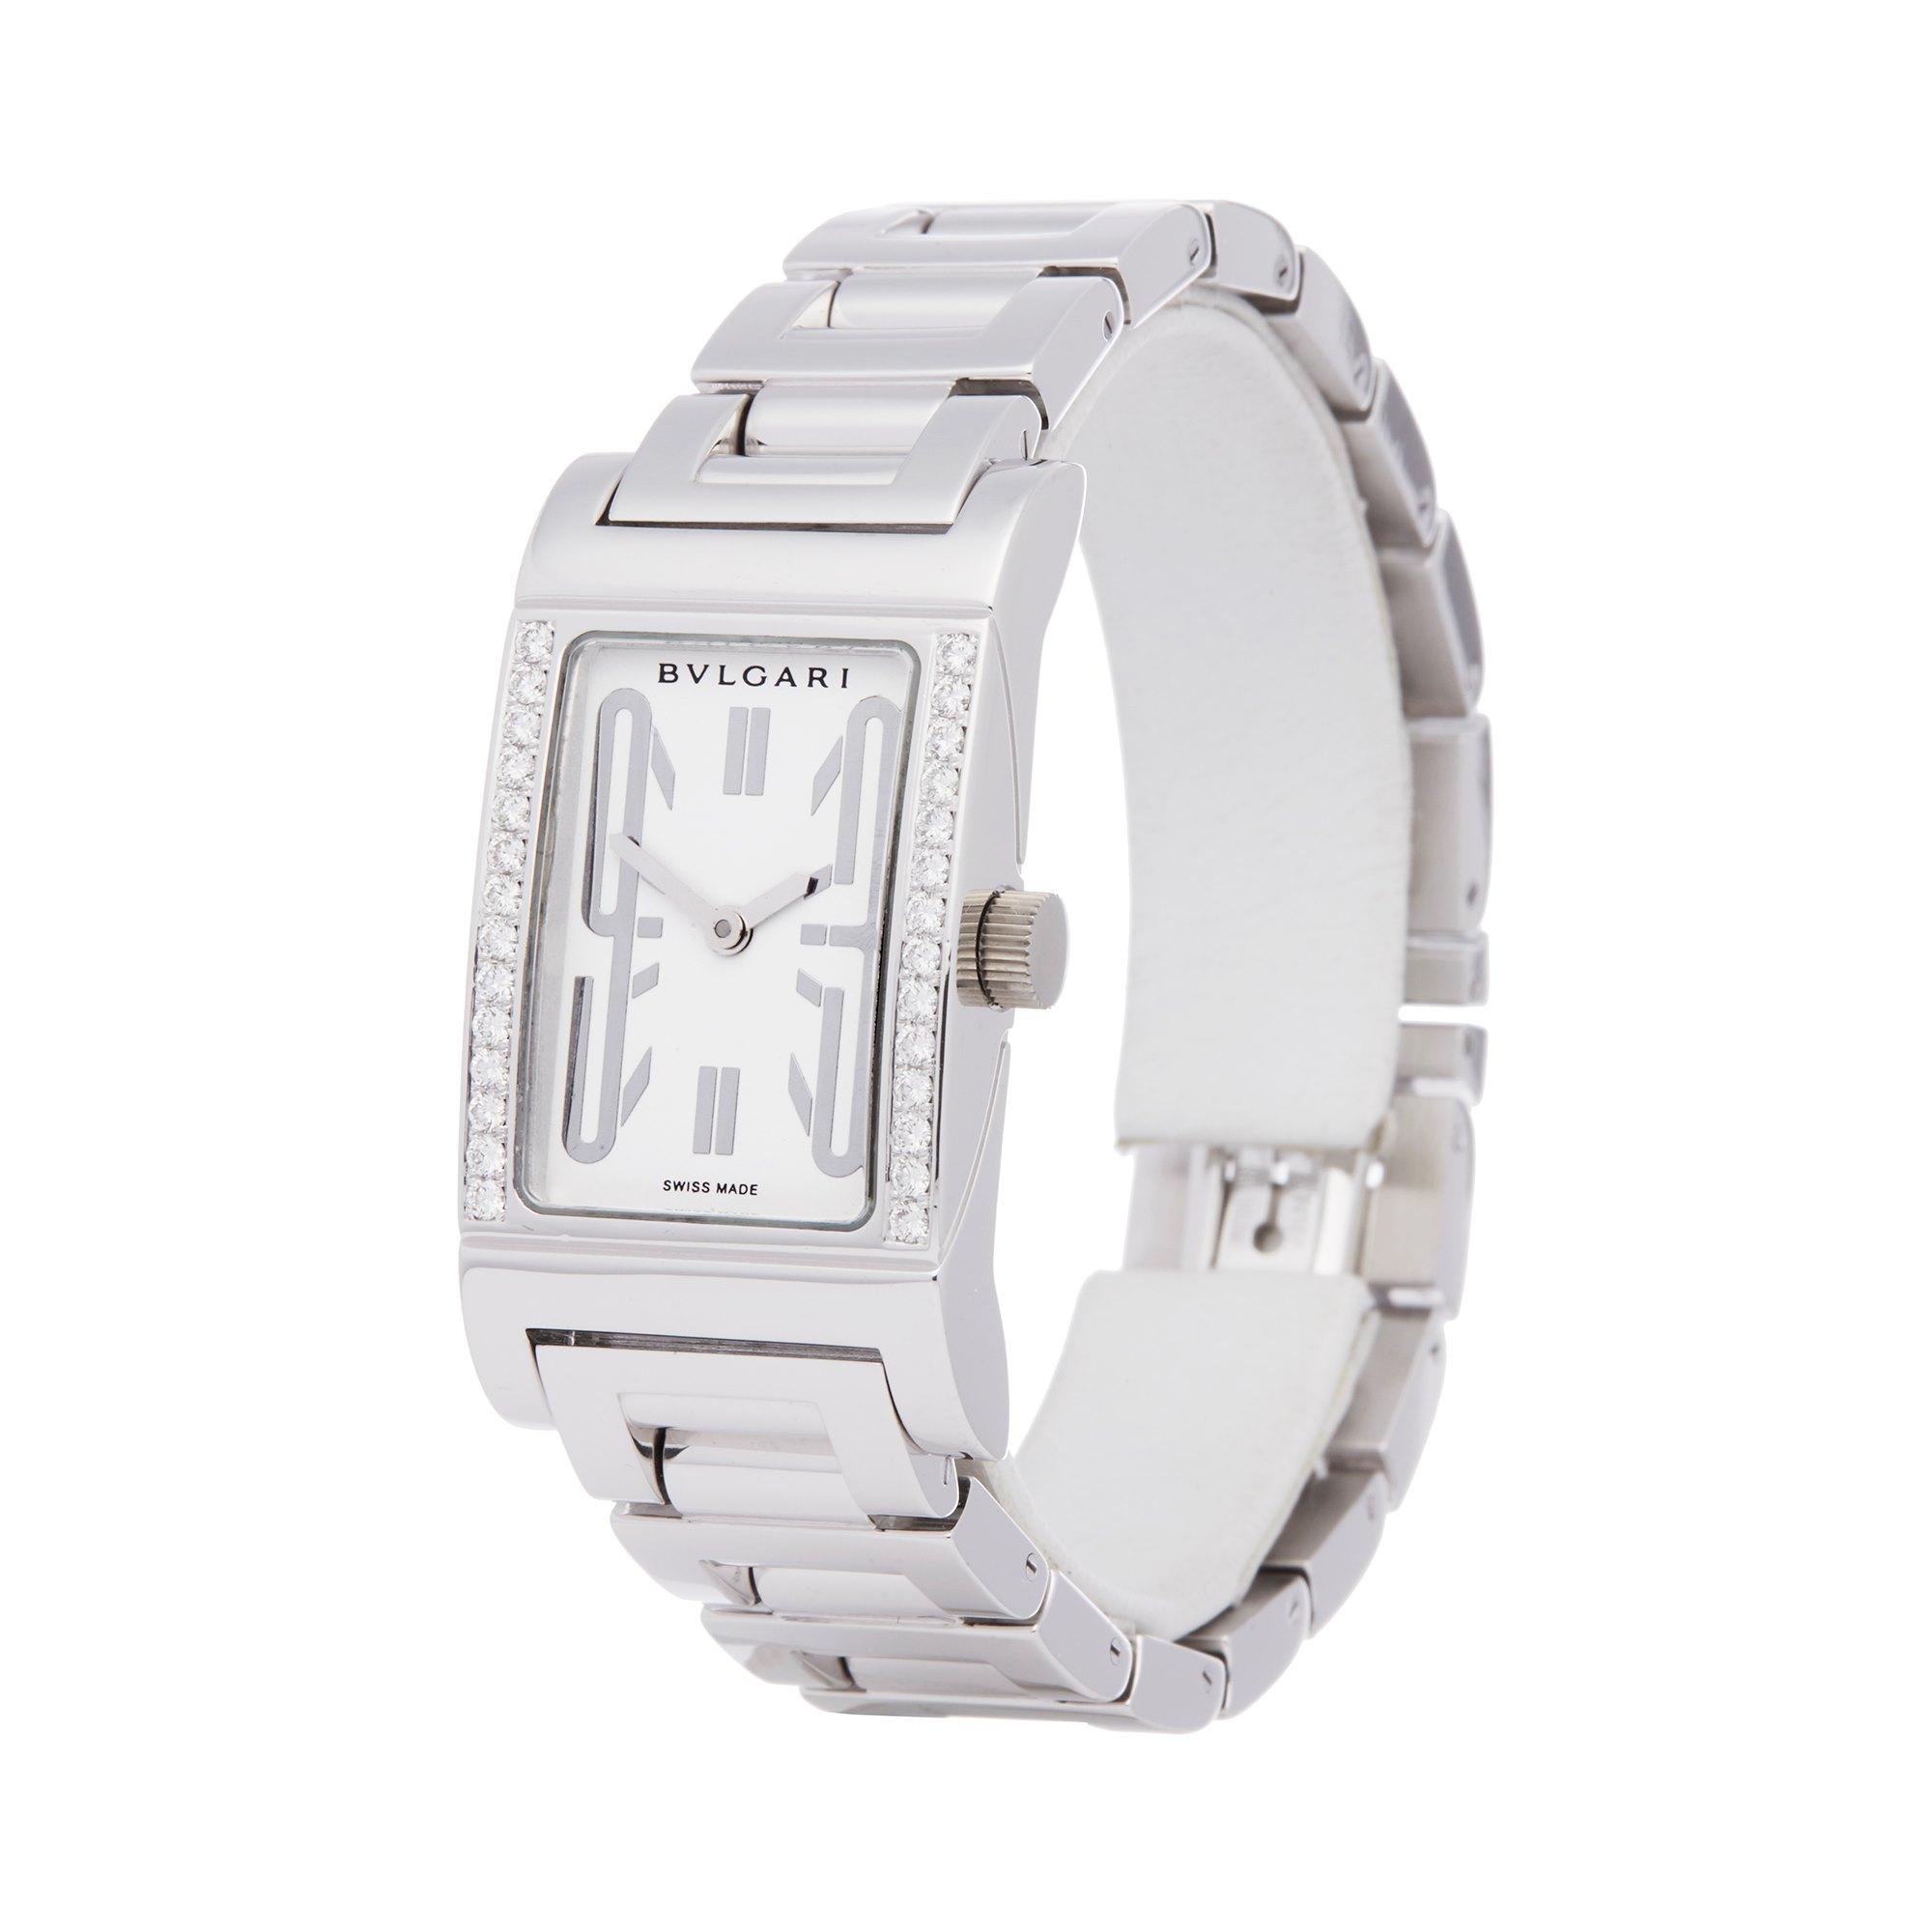 Bulgari Rettongolo Diamond 18K White Gold RT W39 G